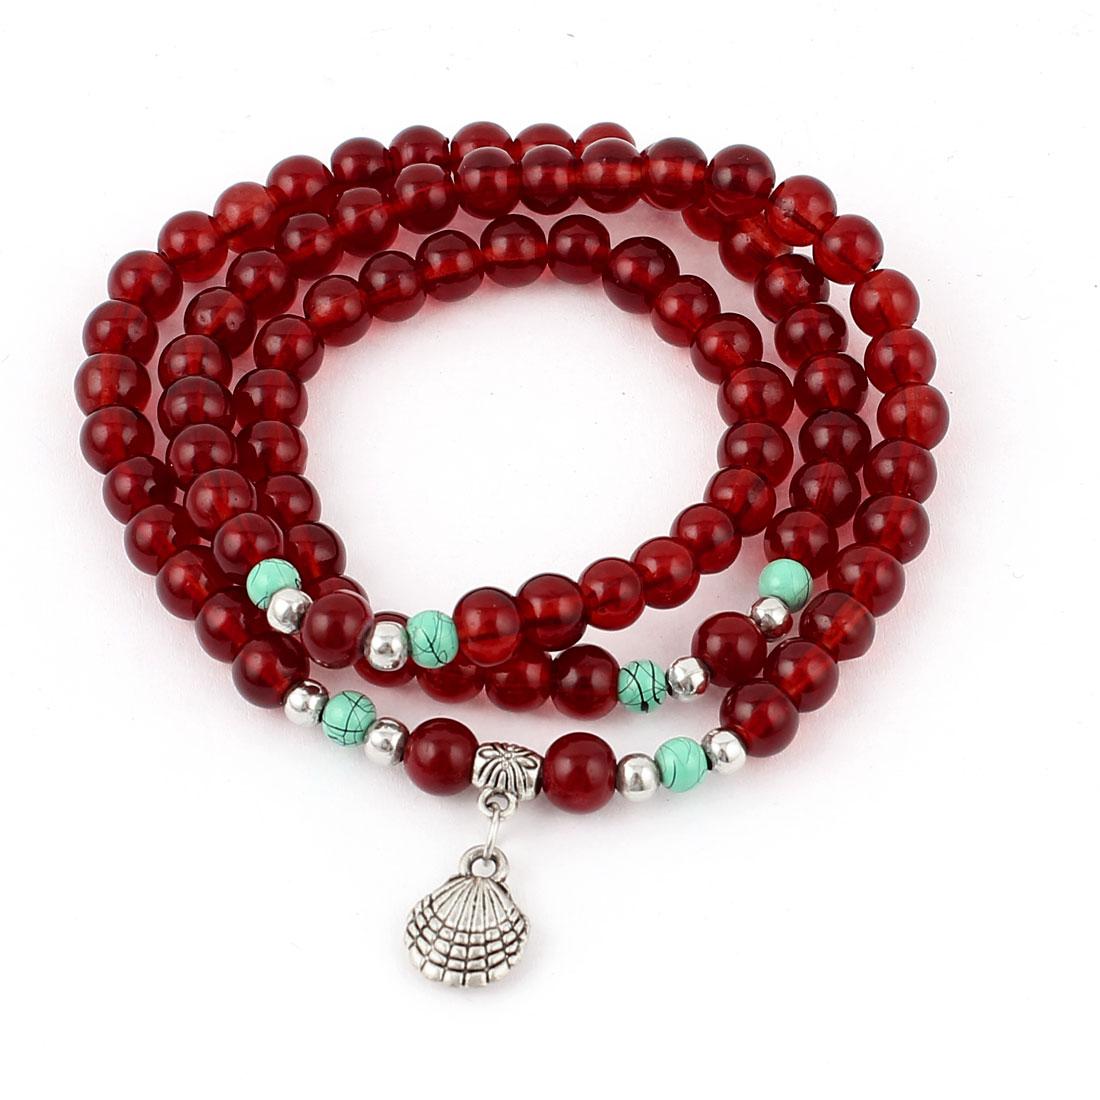 Women Seashell Pendant Decor Plastic Crystal Beads Linked Bracelet Necklace Carmine